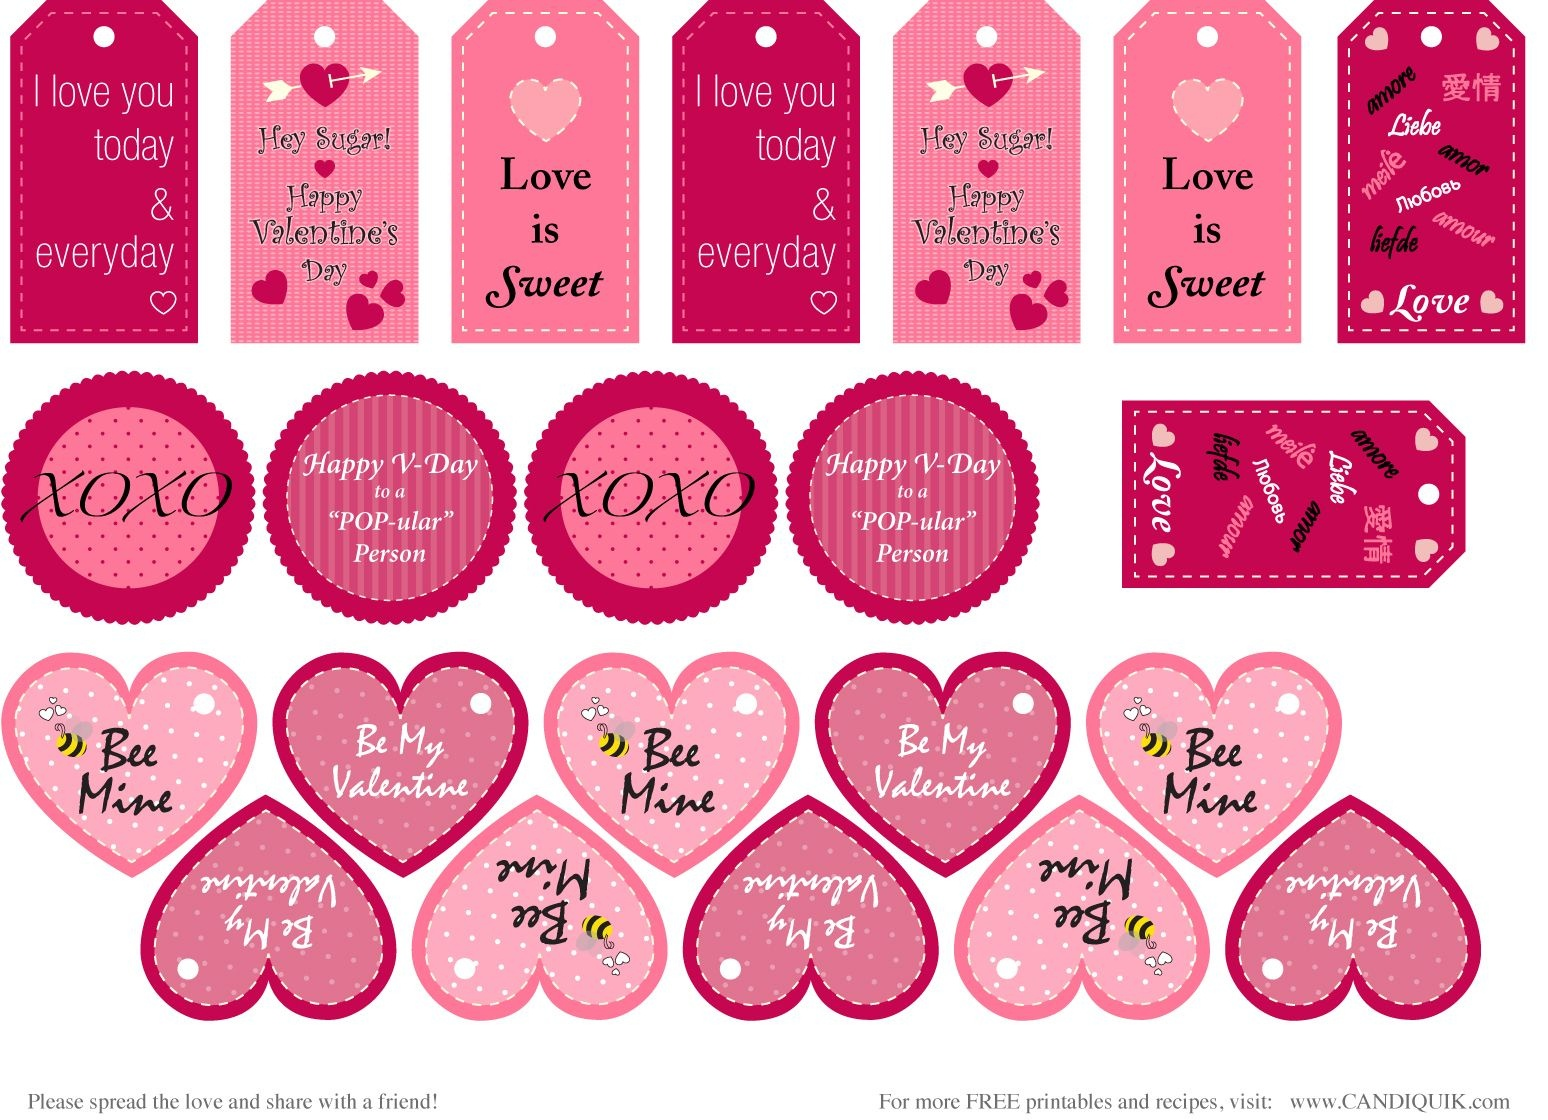 Free} Printables   Valentines   Valentine's Day Printables - Free Printable Valentines Day Tags